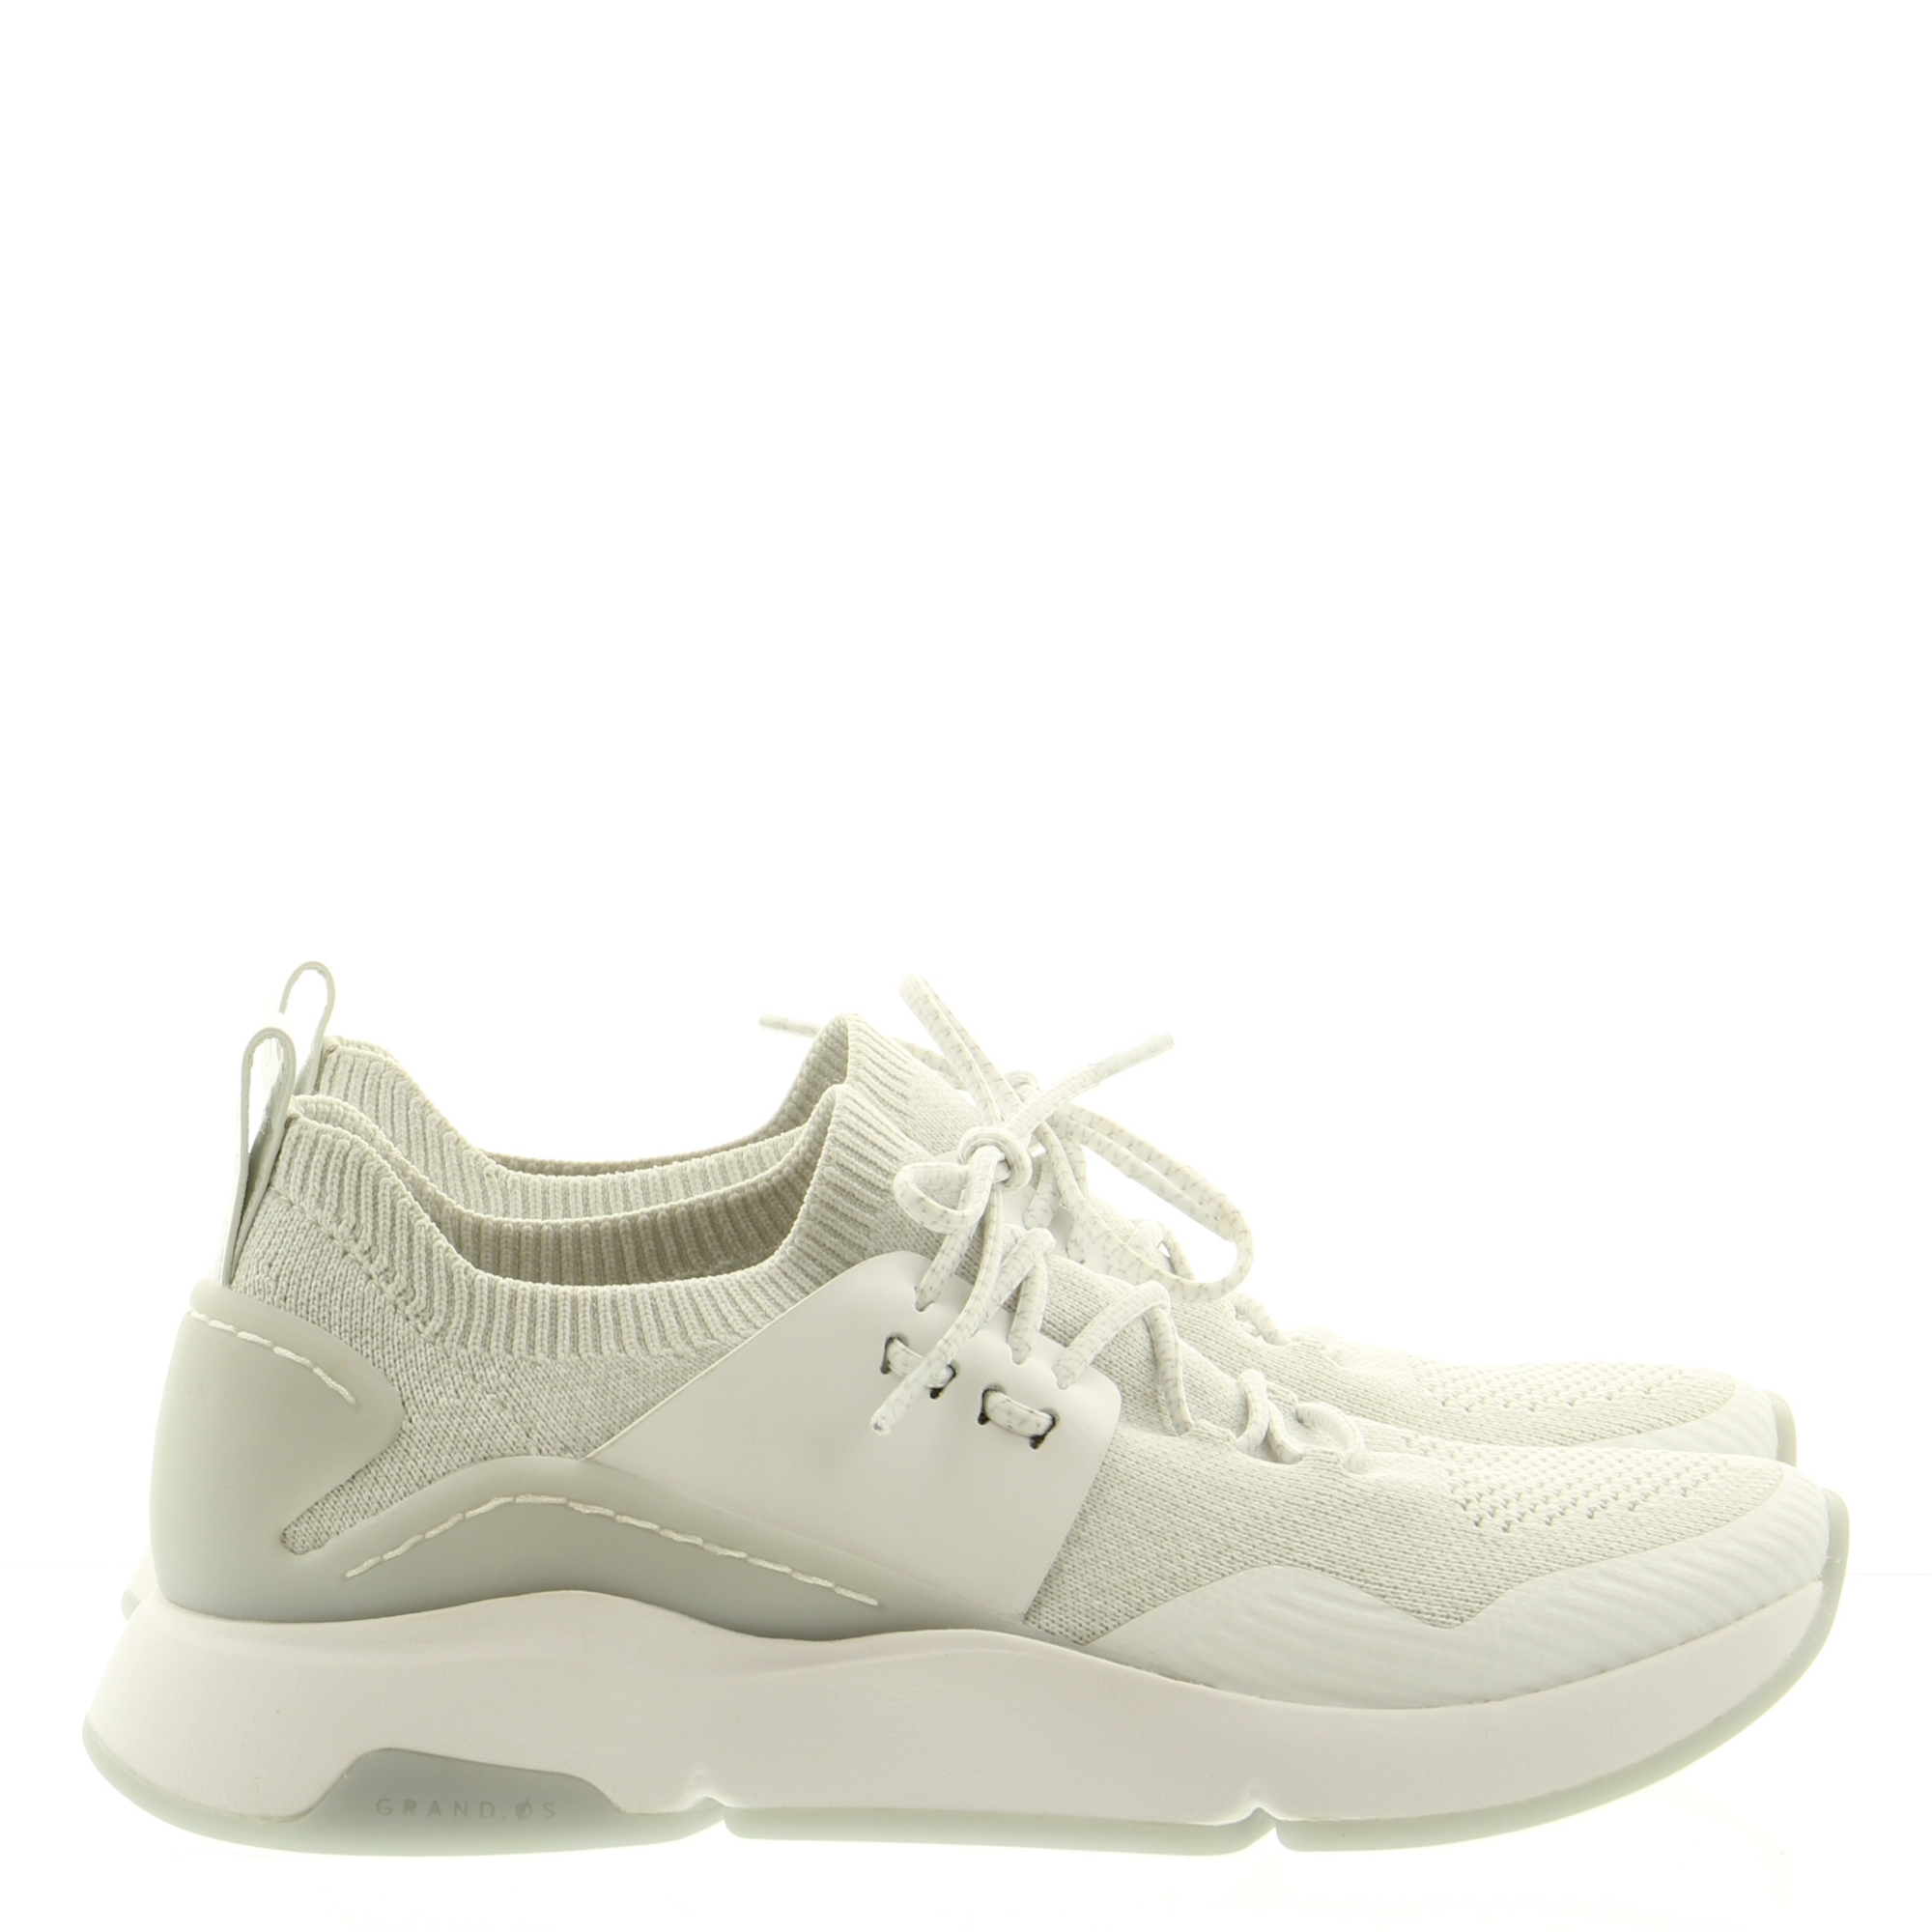 Cole Haan W13348 optic white